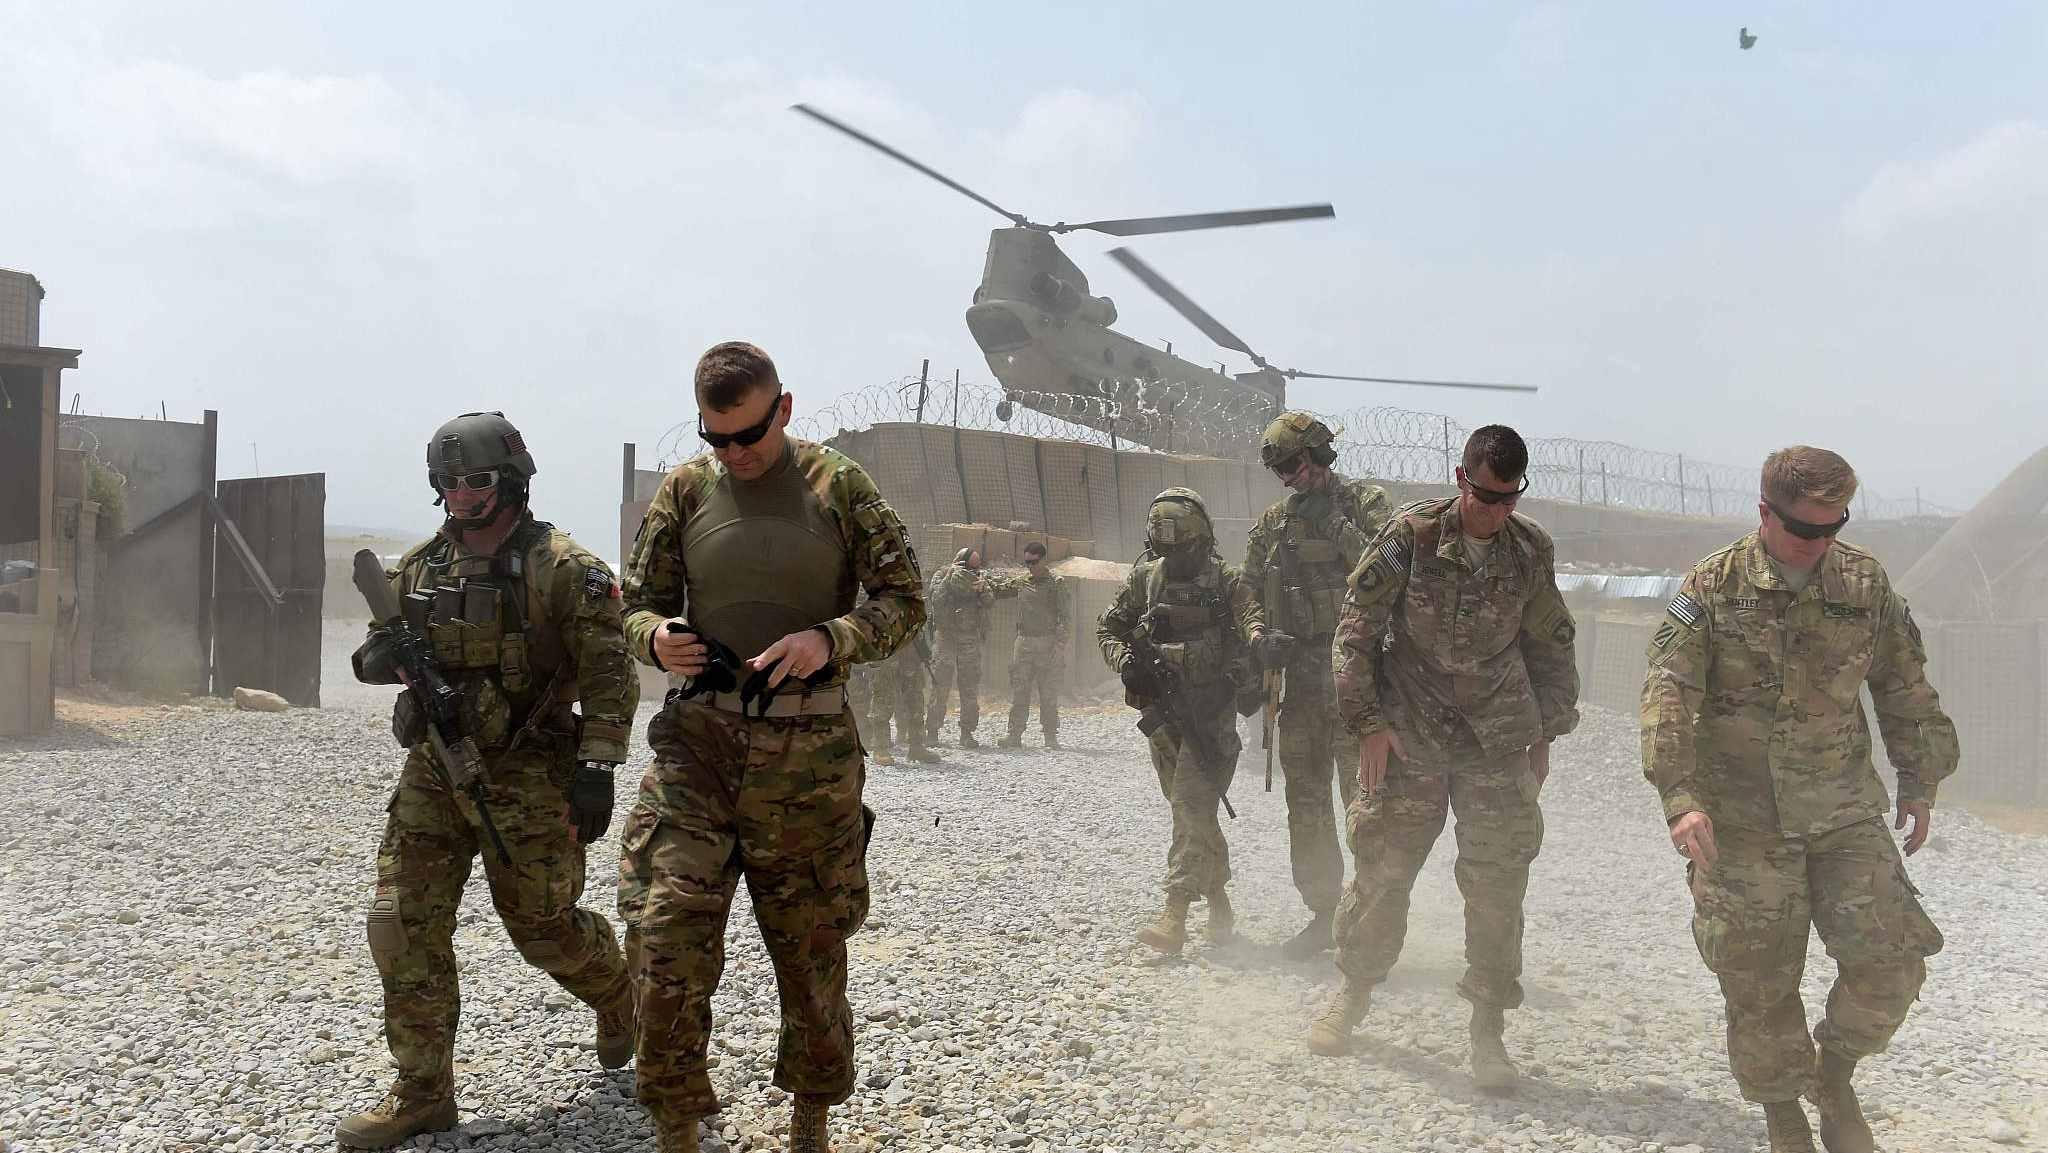 Trump to order further drawdown from Afghanistan, Iraq: media